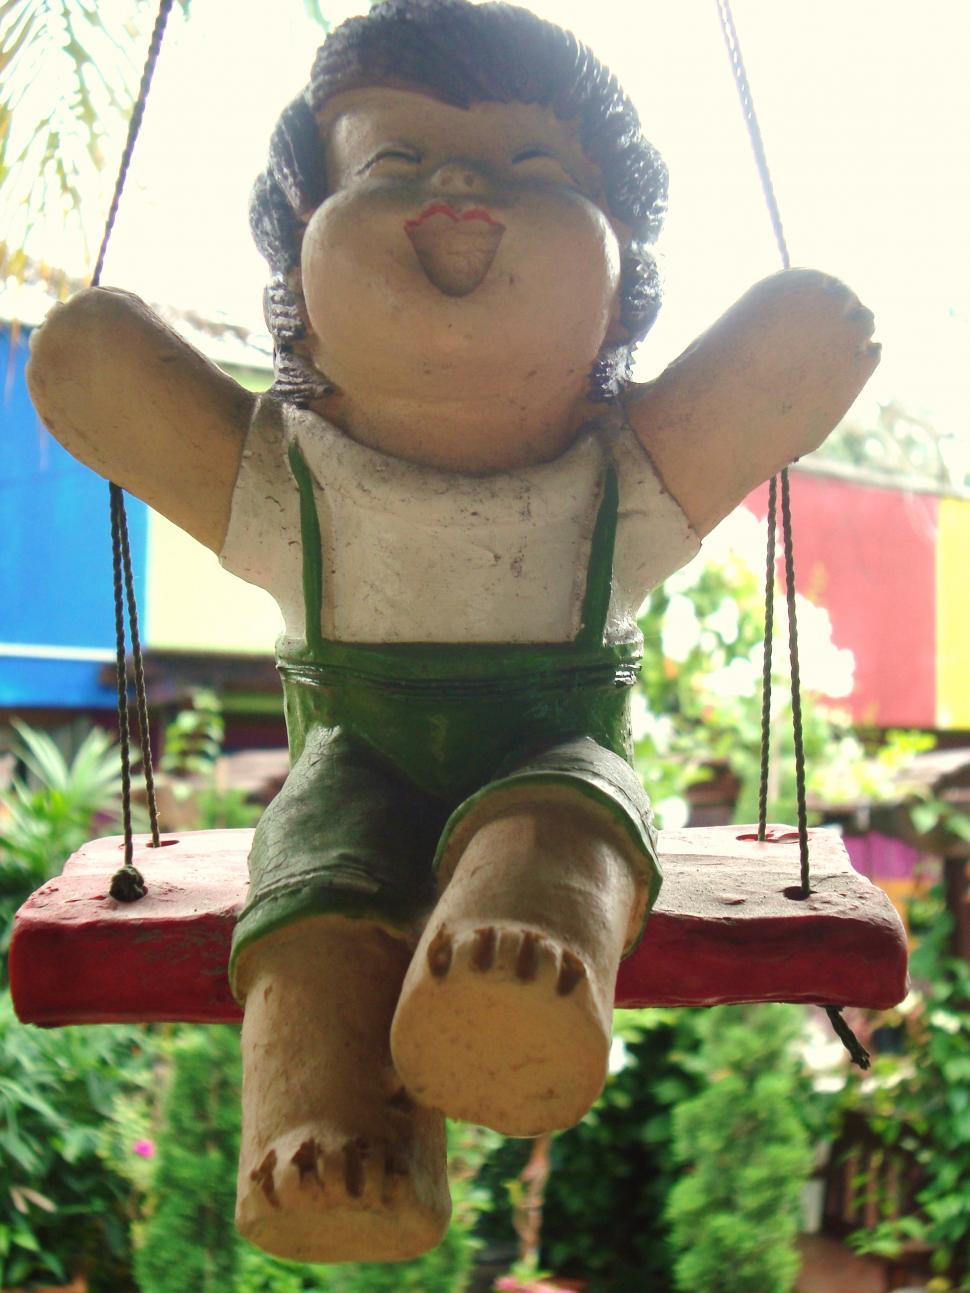 Download Free Stock HD Photo of Boy Swing Garden Decoration Online